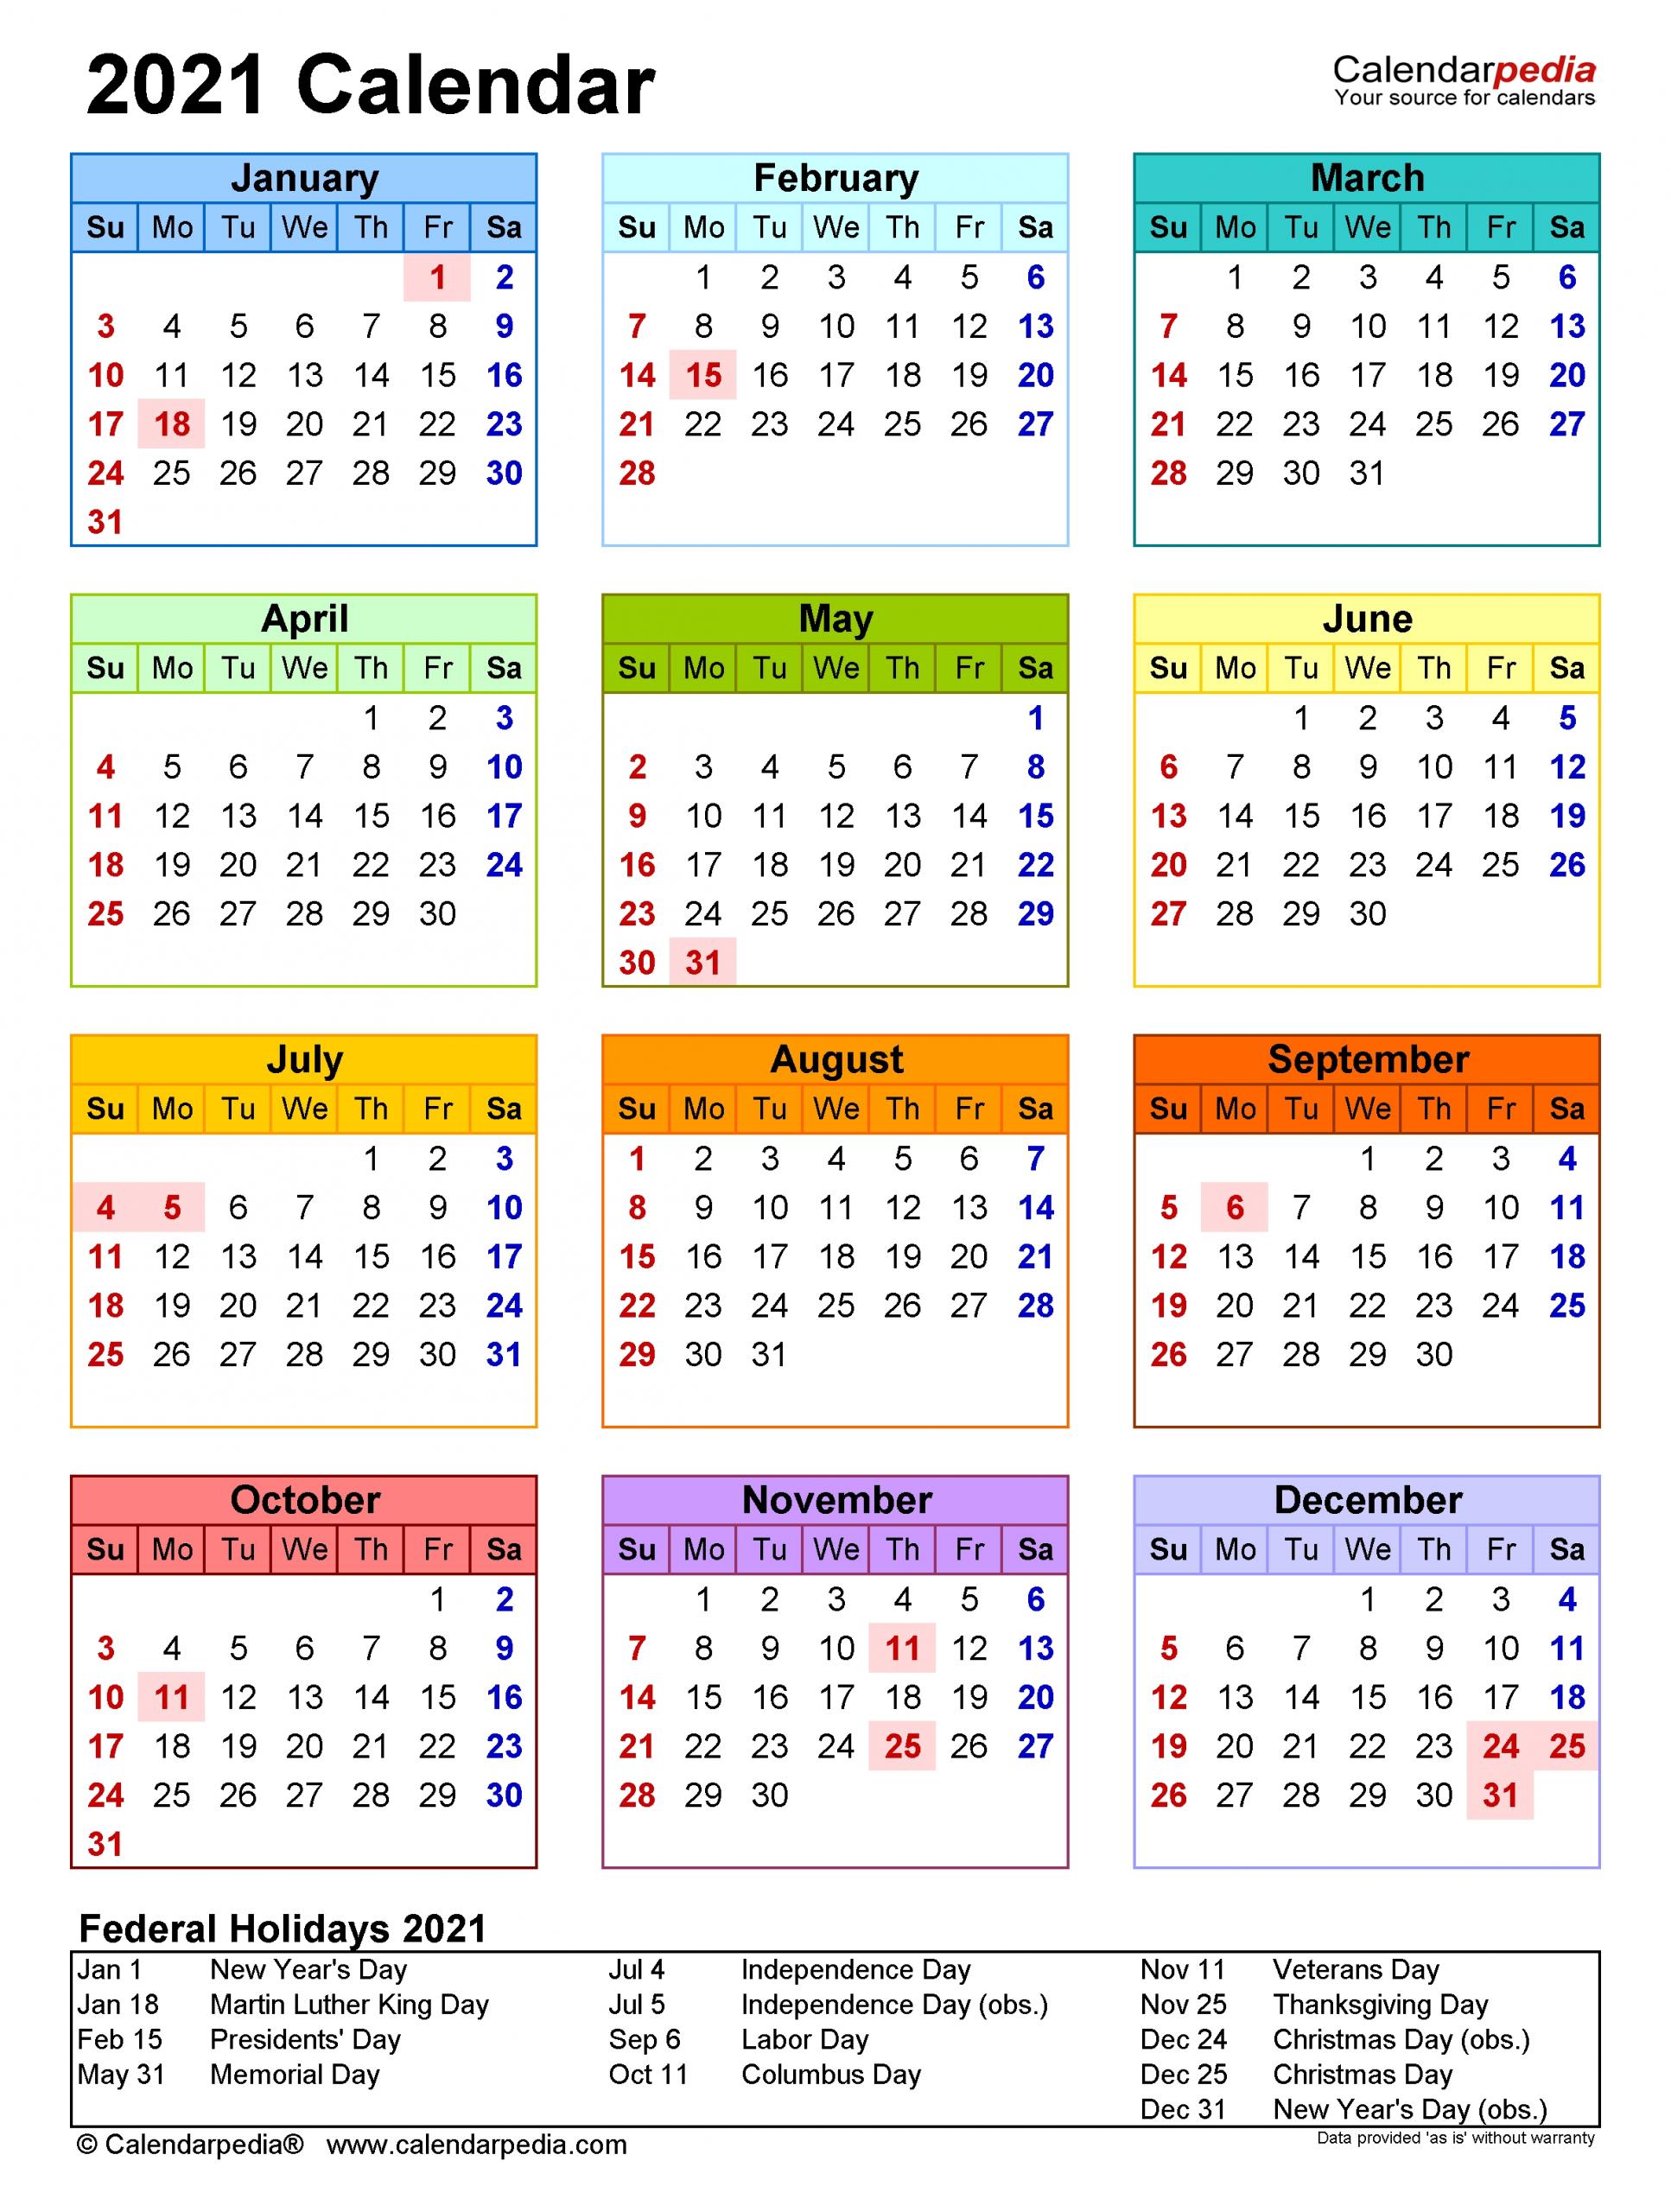 2021 Calendar - Free Printable Excel Templates - Calendarpedia throughout Free Printable 2021 Calendar Portrait Photo